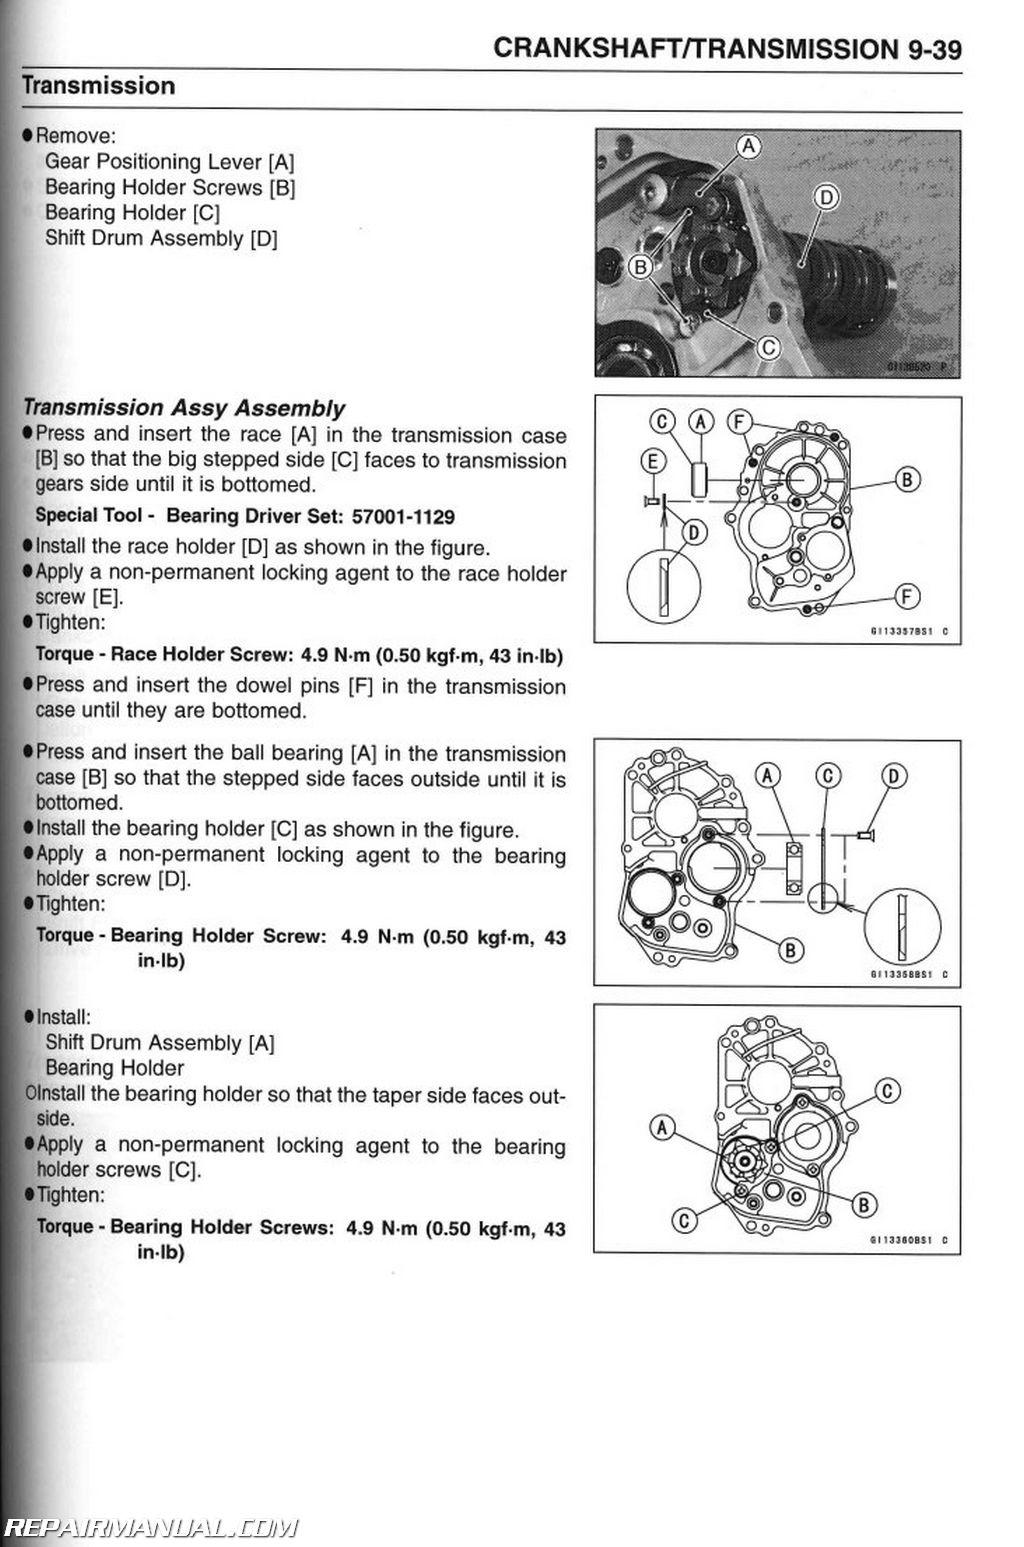 fuse box diagram 1995 zx 600r wiring library Mercury Mountian Fuse Box Diagram 2007 2008 kawasaki ninja zx 6r zx600p motorcycle service manual